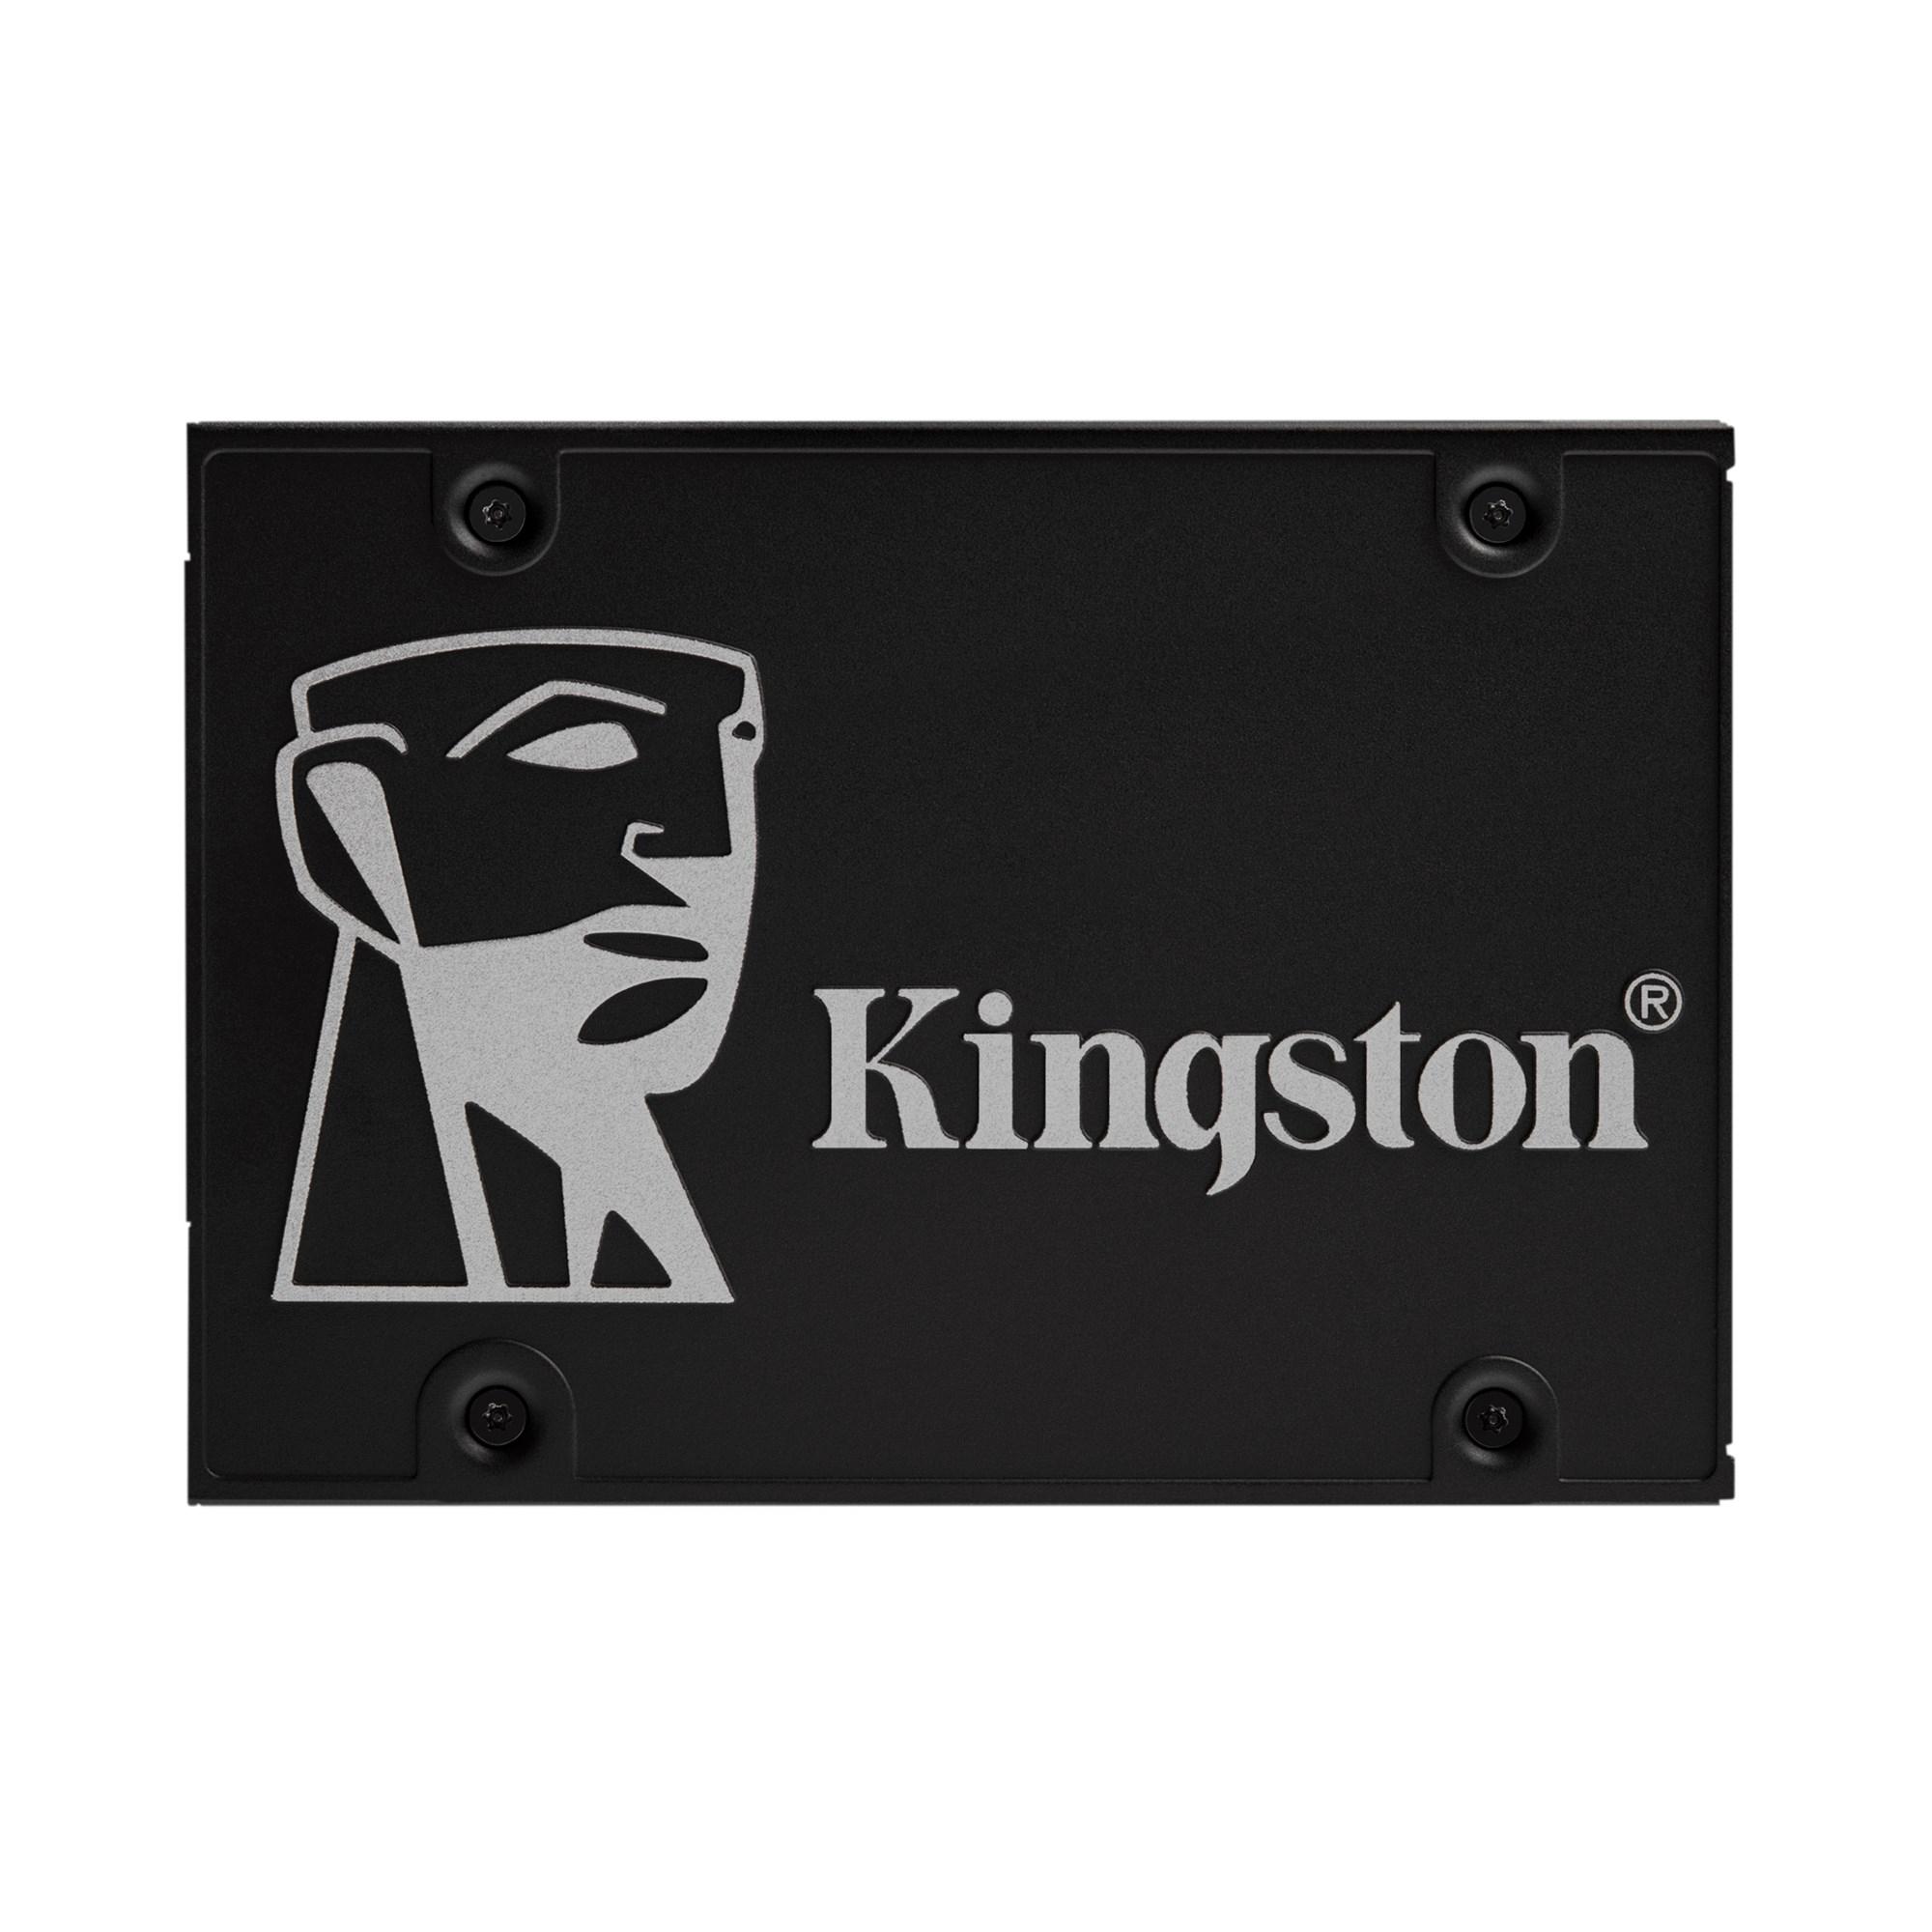 "Kingston KC600B 256 GB SSD schwarz SATA 6Gb/s 2,5"" BULK"